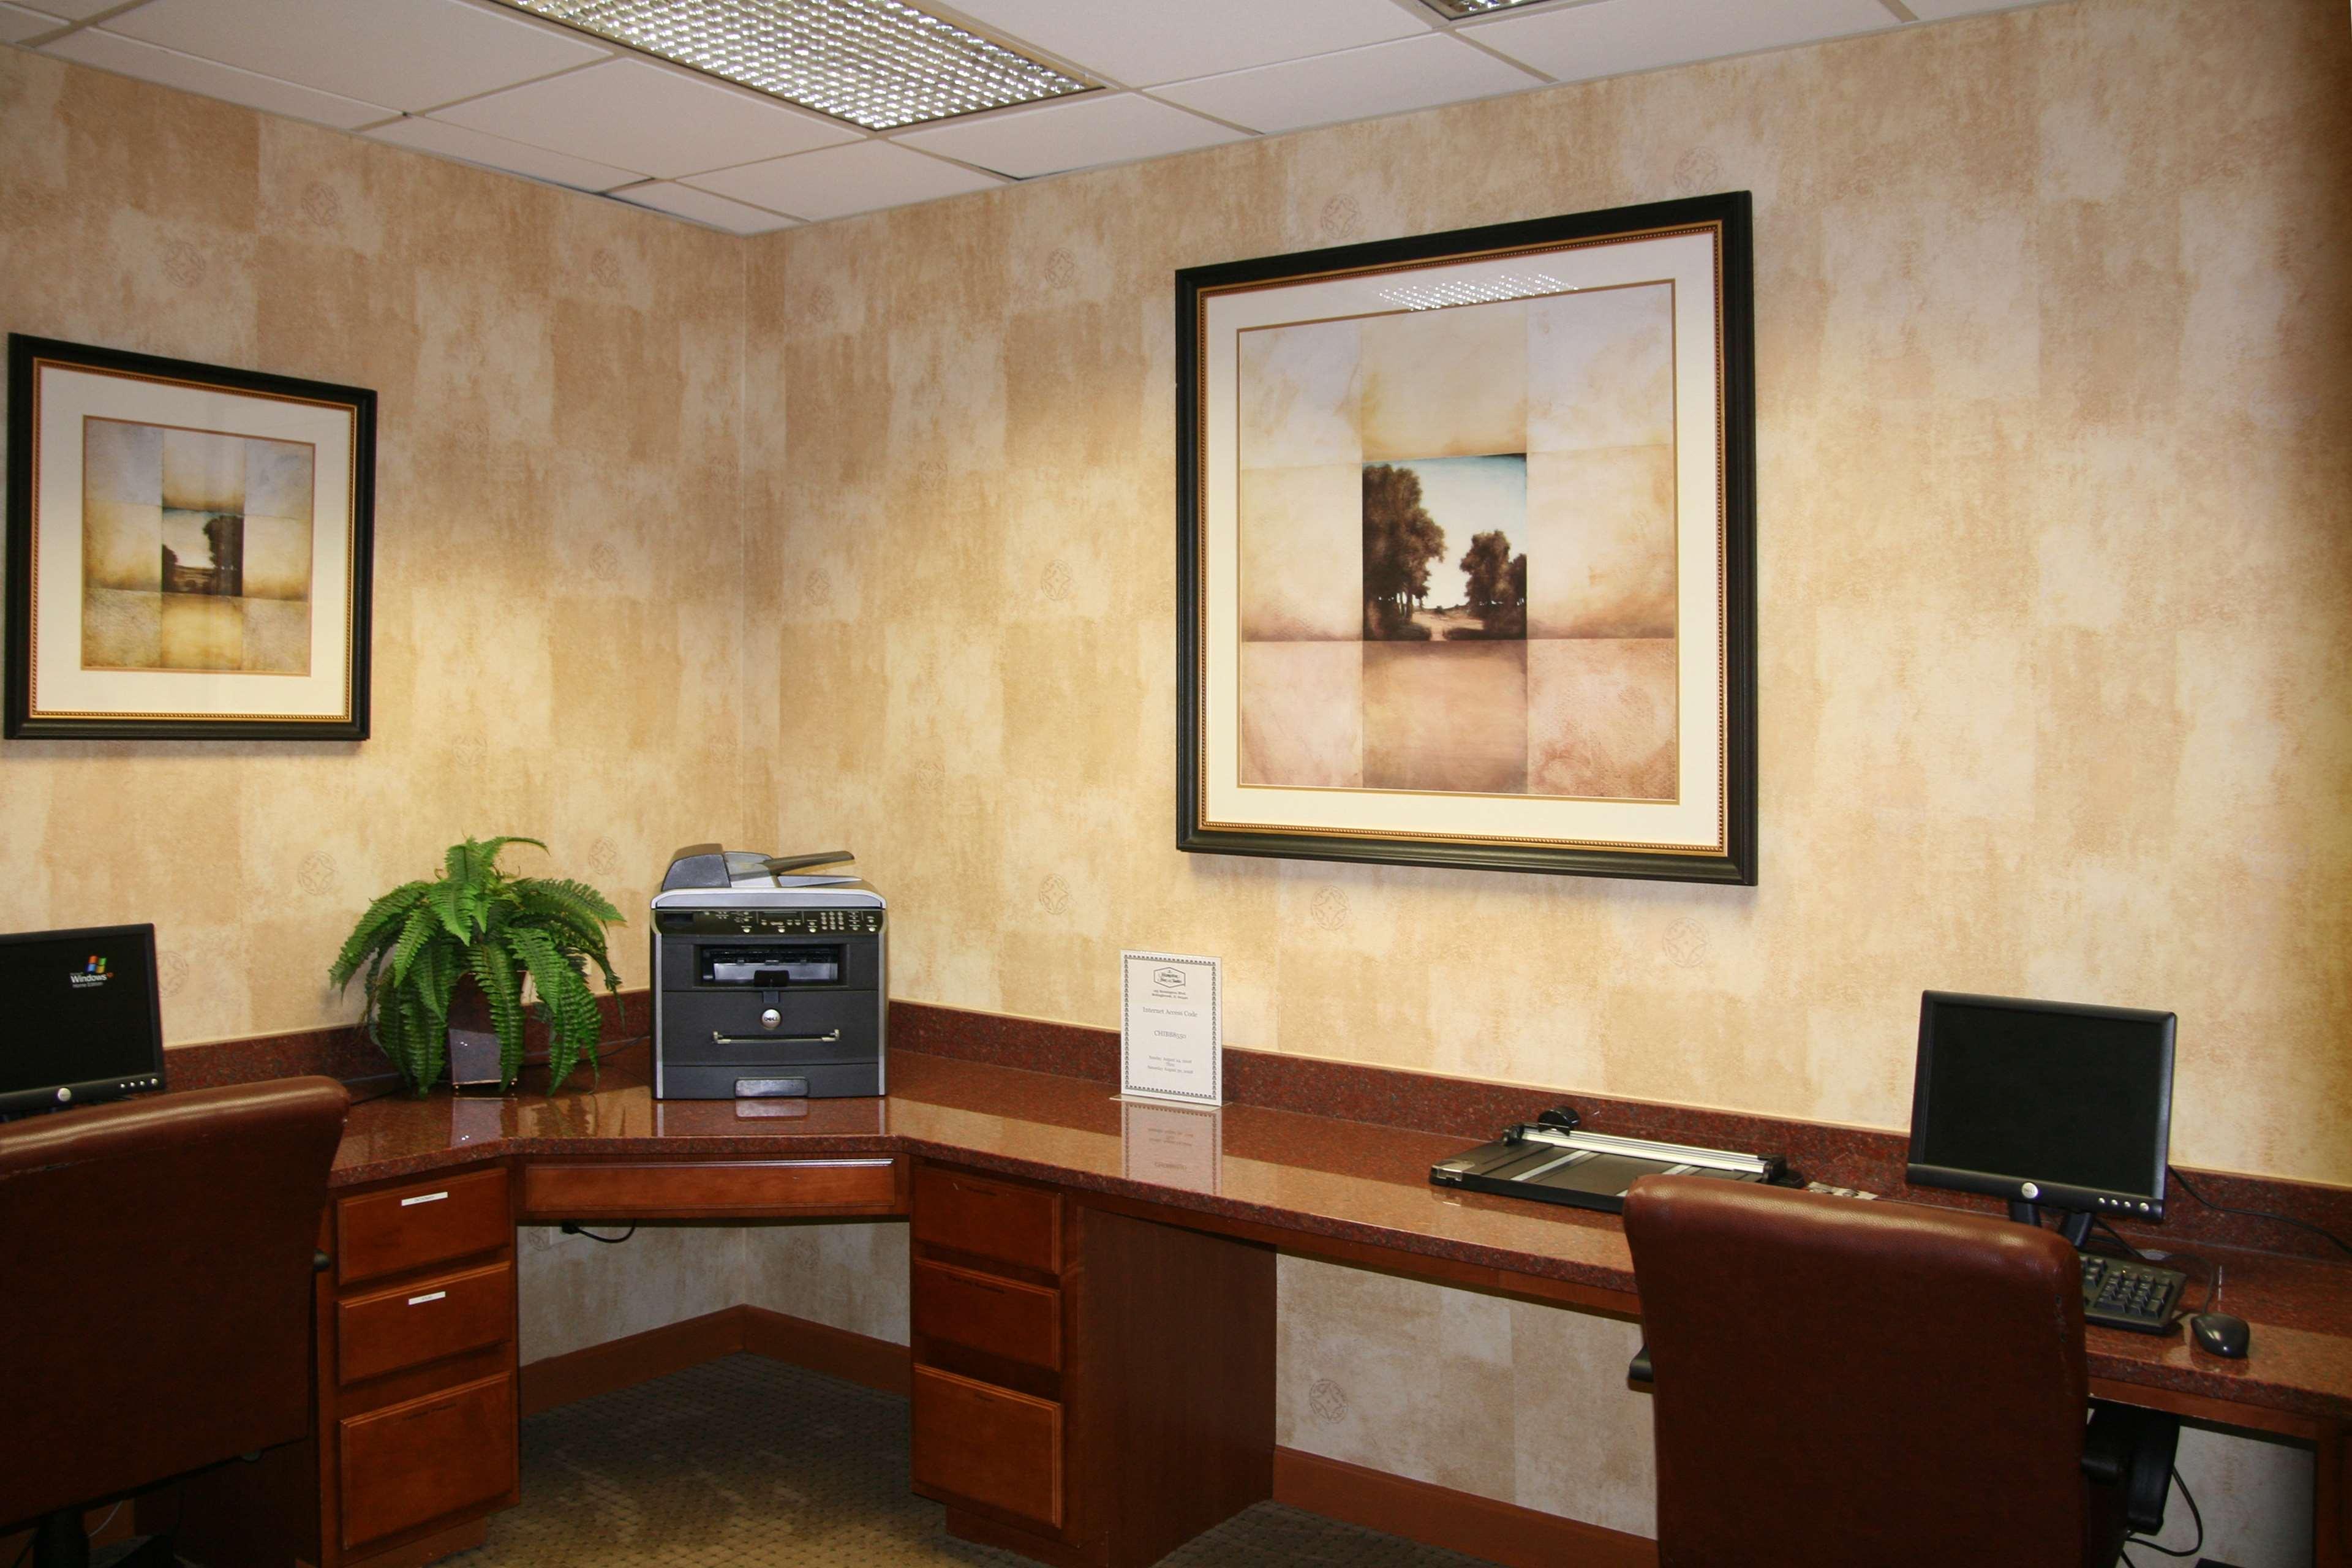 Hampton Inn & Suites Bolingbrook image 27